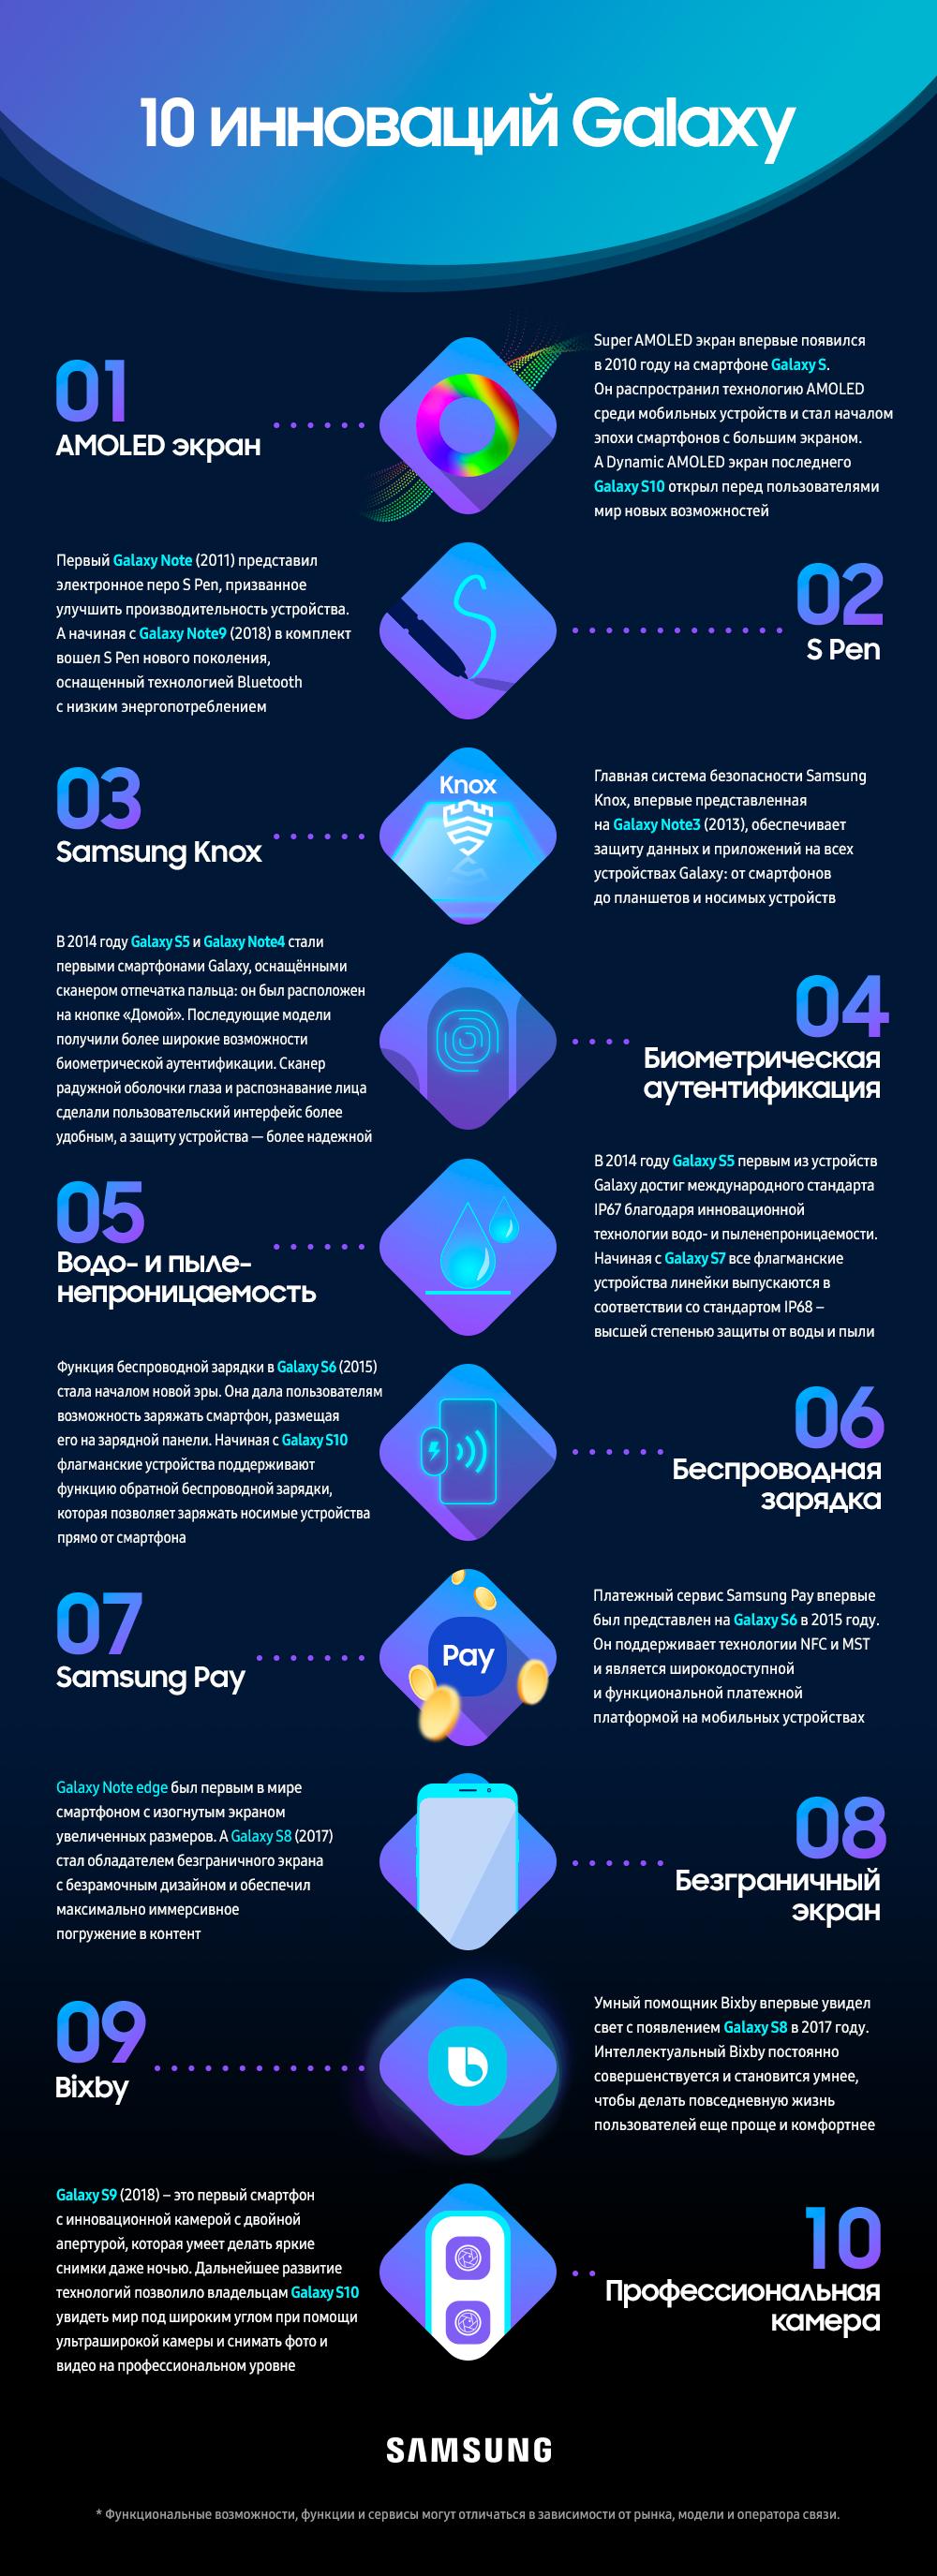 10 инноваций Samsung Galaxy